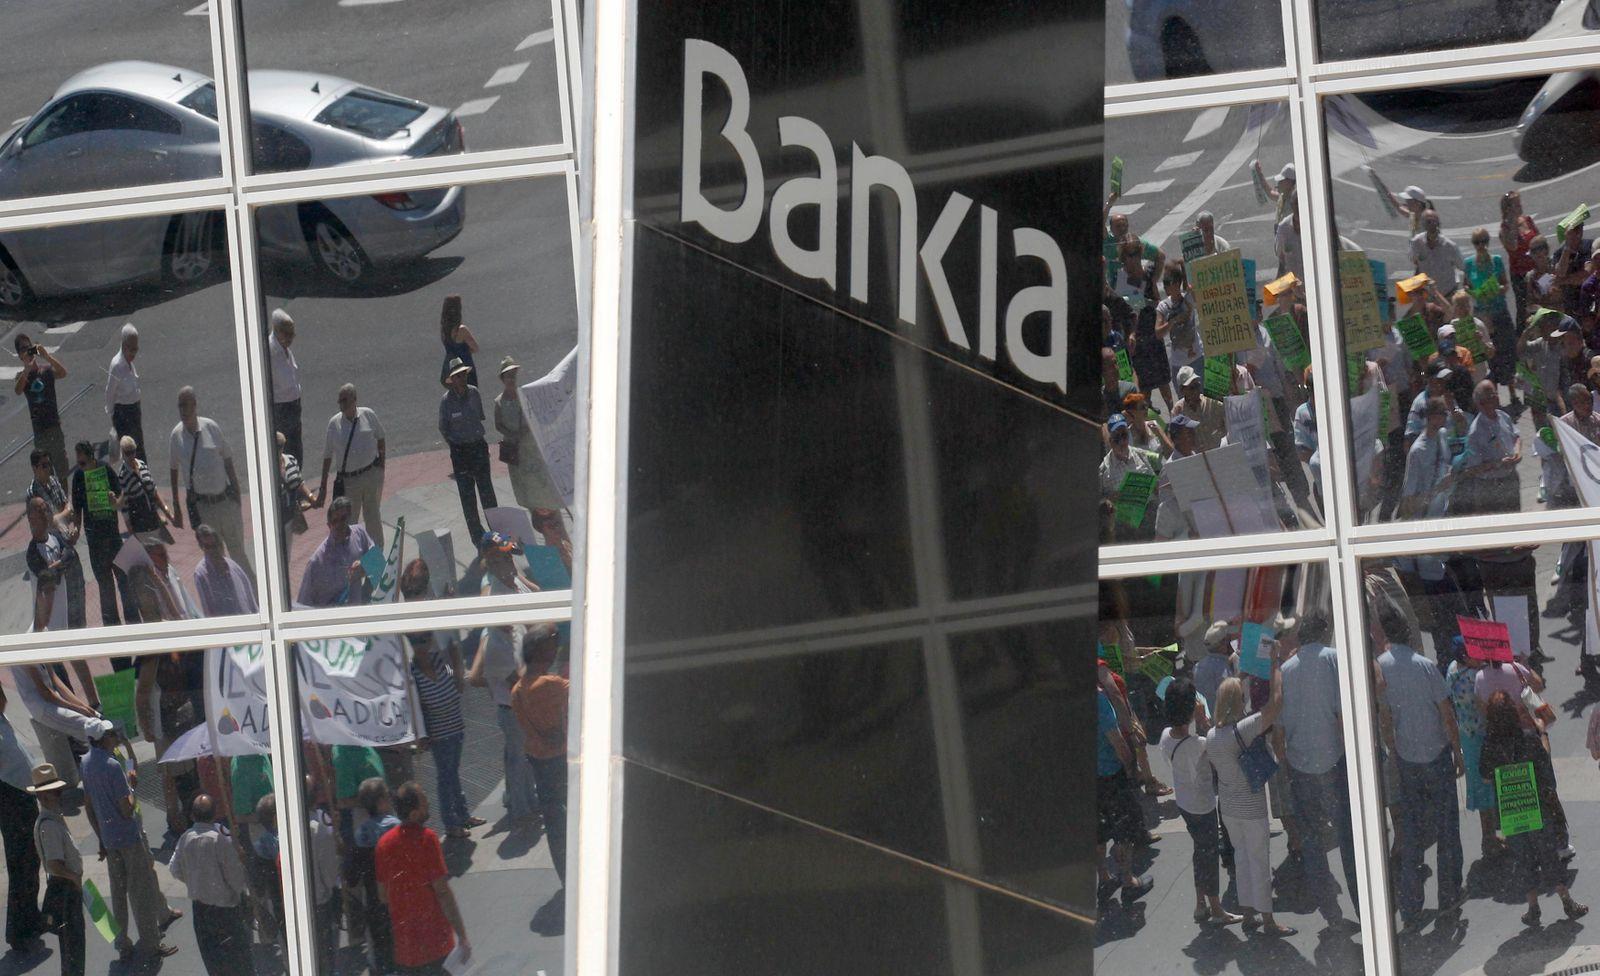 SPAIN-BANKS/DECREE